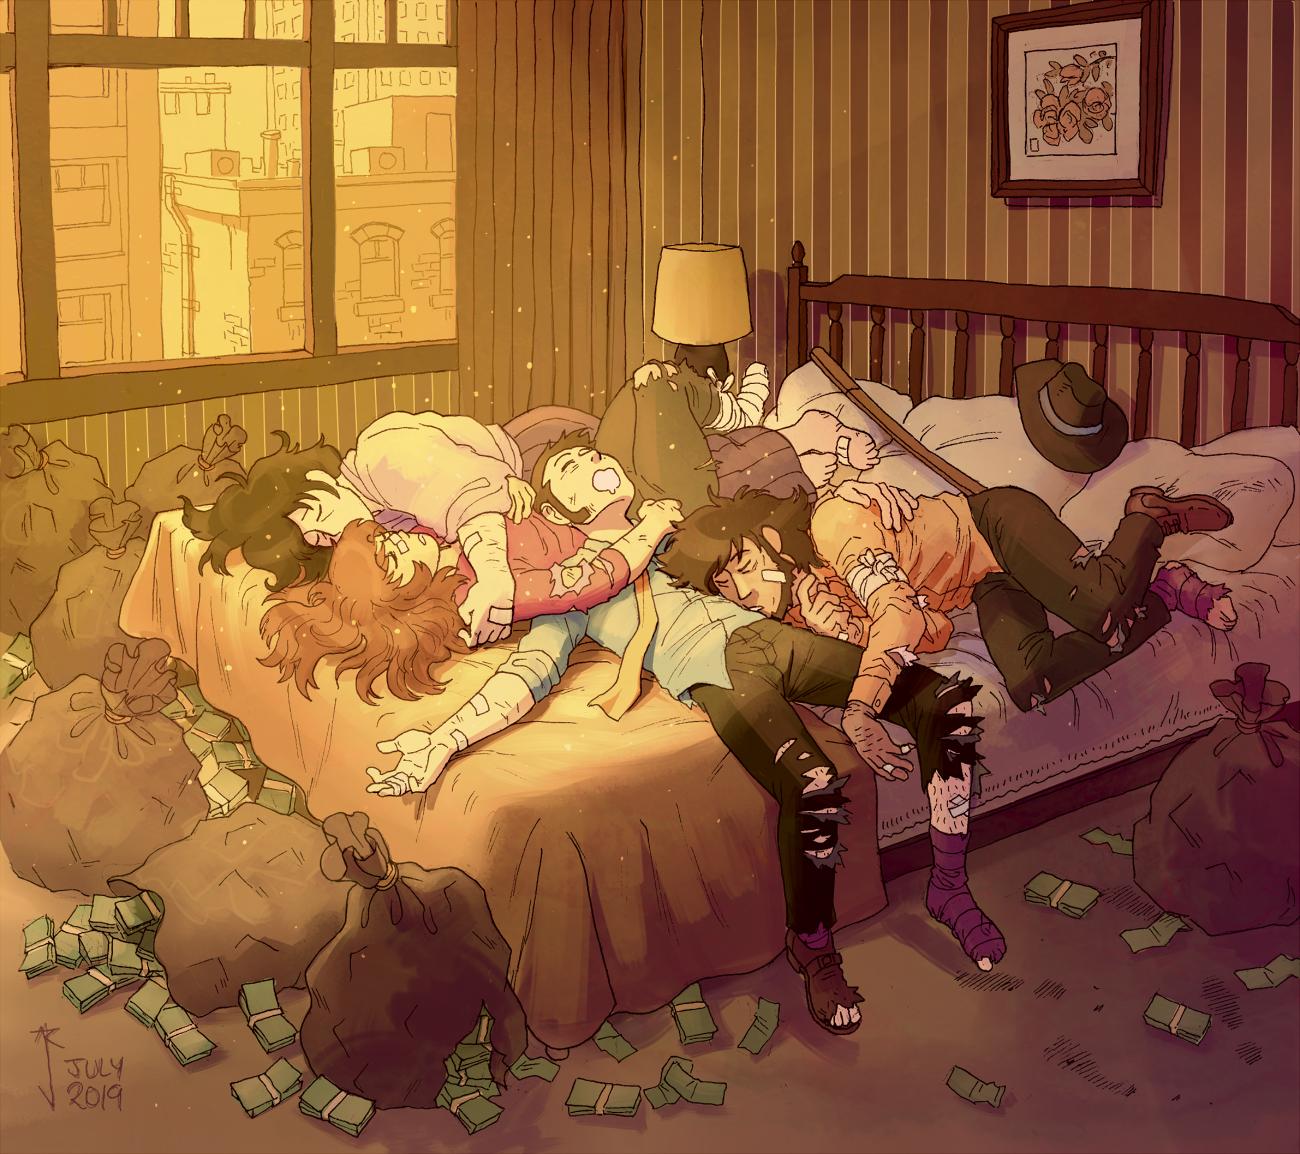 lupin & his sleepy rogues